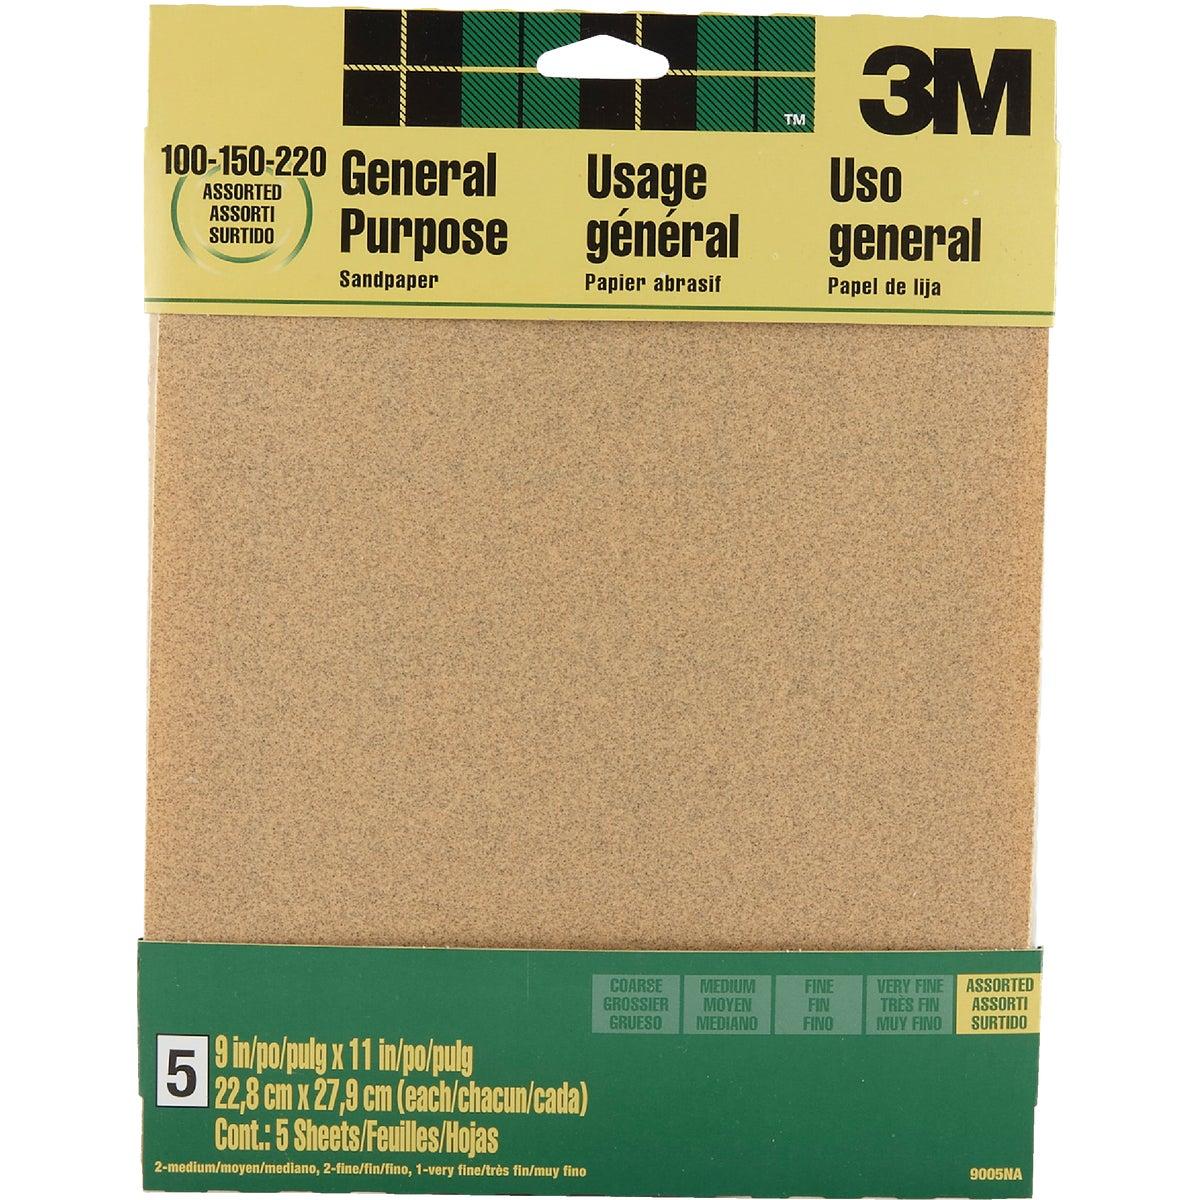 3M General Purpose 9 In. x 11 In. 220/150/100 Grit Assorted Grade Sandpaper (5-Pack)